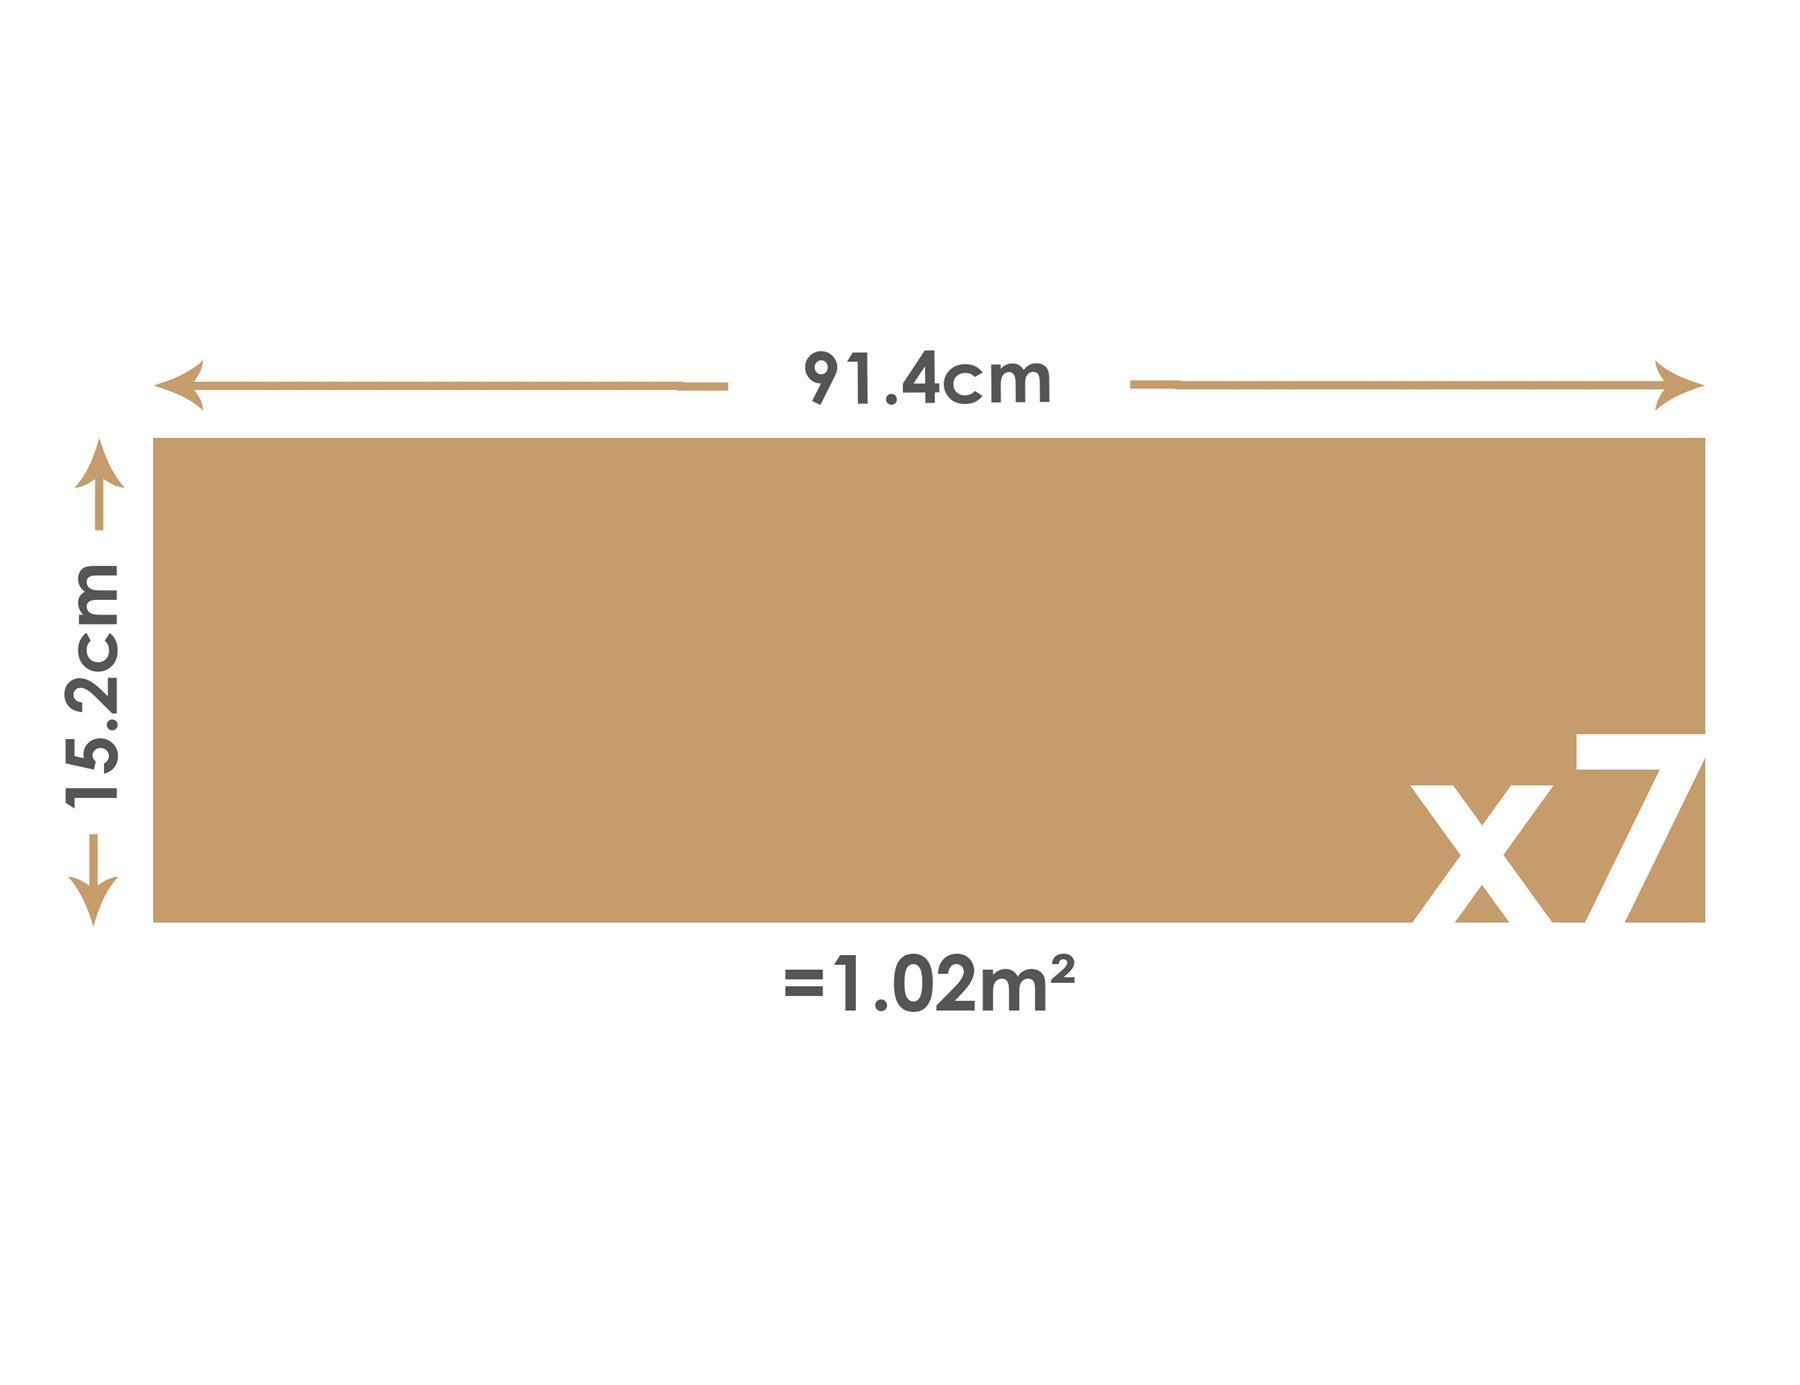 thumbnail 4 - Floor Planks Tiles Self Adhesive Vinyl Brown Wood Flooring Kitchen Bathroom